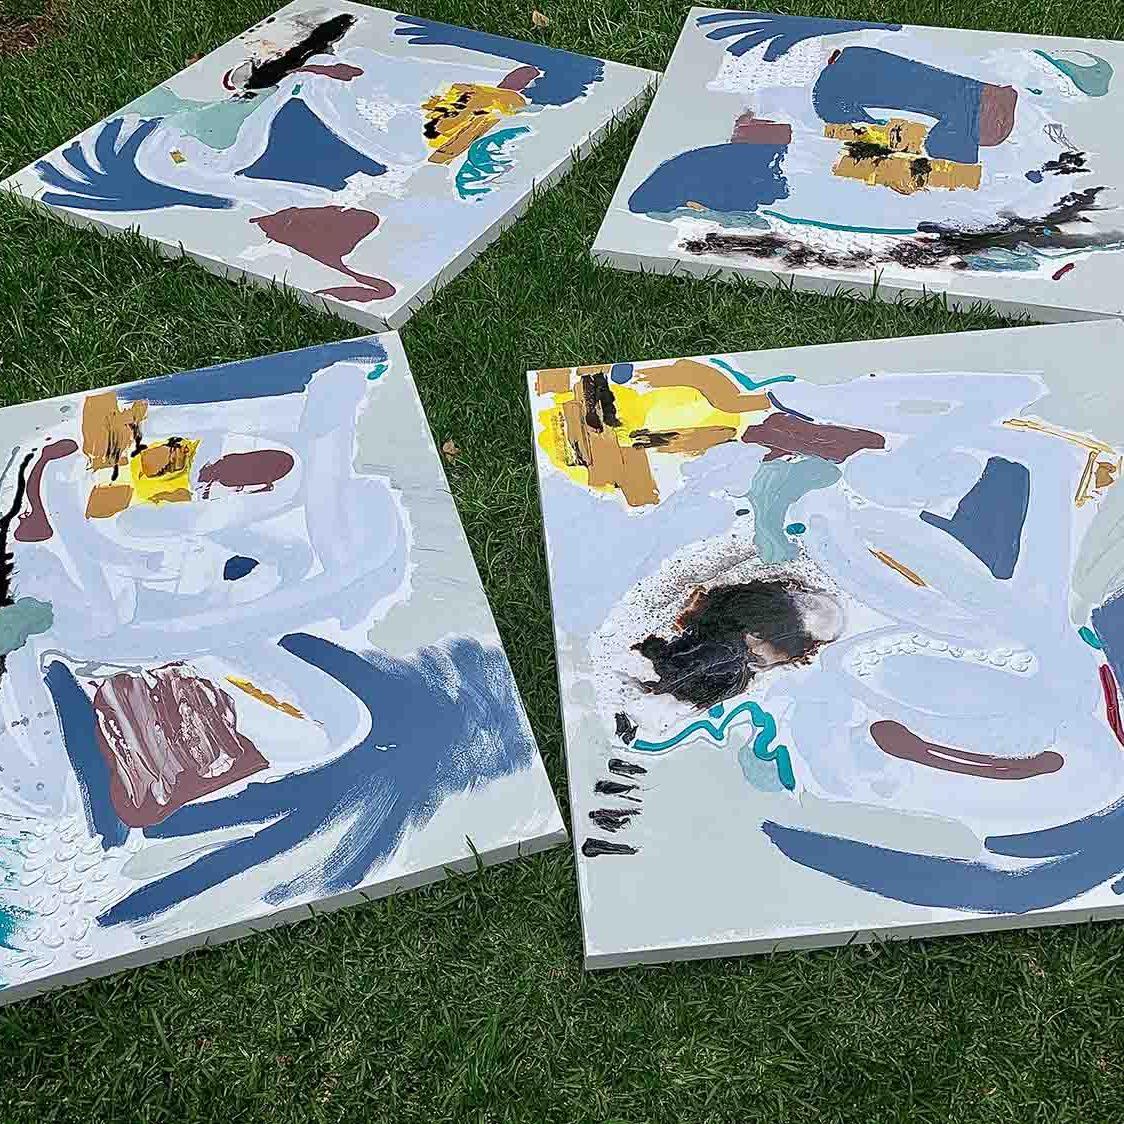 Australian Art - 4 happy colourful paintings - Climate Change - Sarah Jane Artist